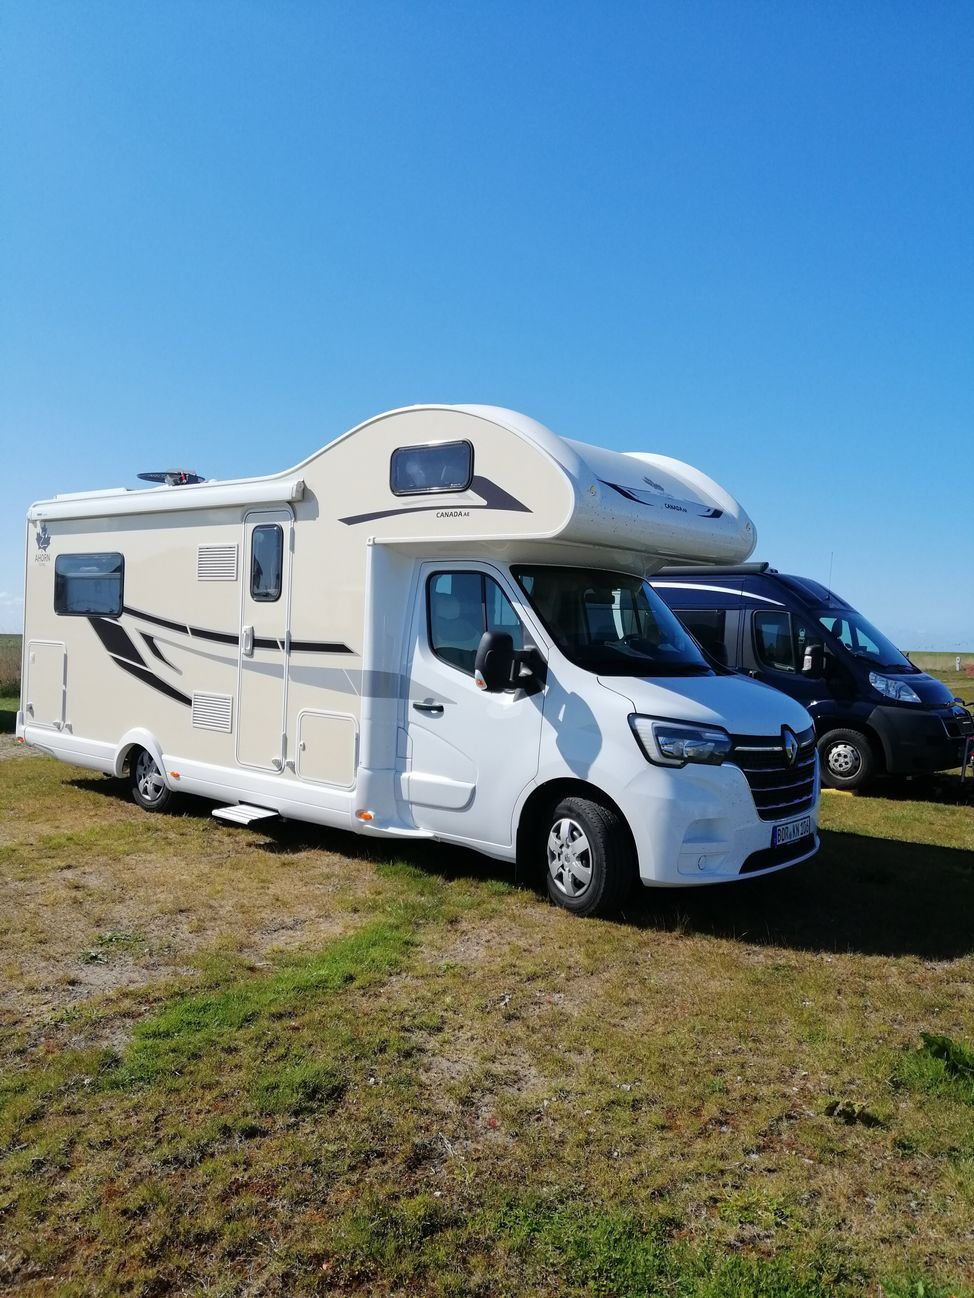 Wohnmobil mieten ab Bocholt  Bereits für 10€/Tag bei erento